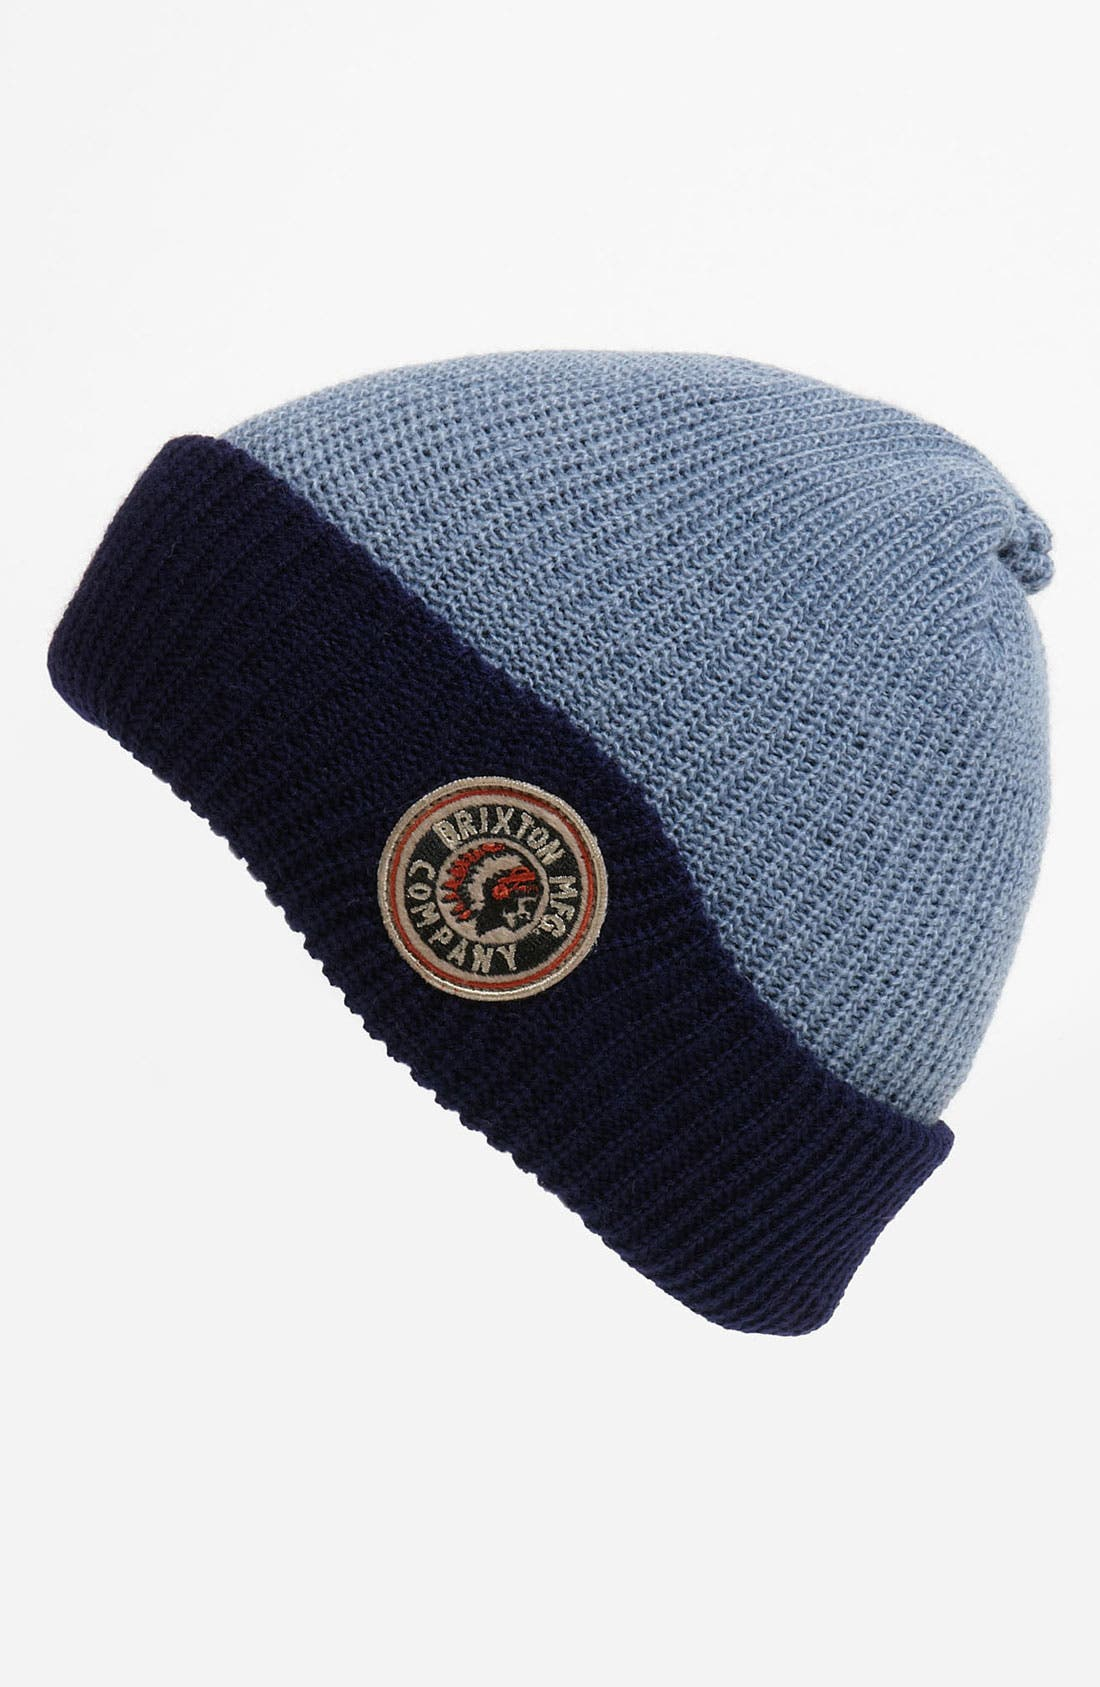 Main Image - Brixton 'Saint' Knit Cap